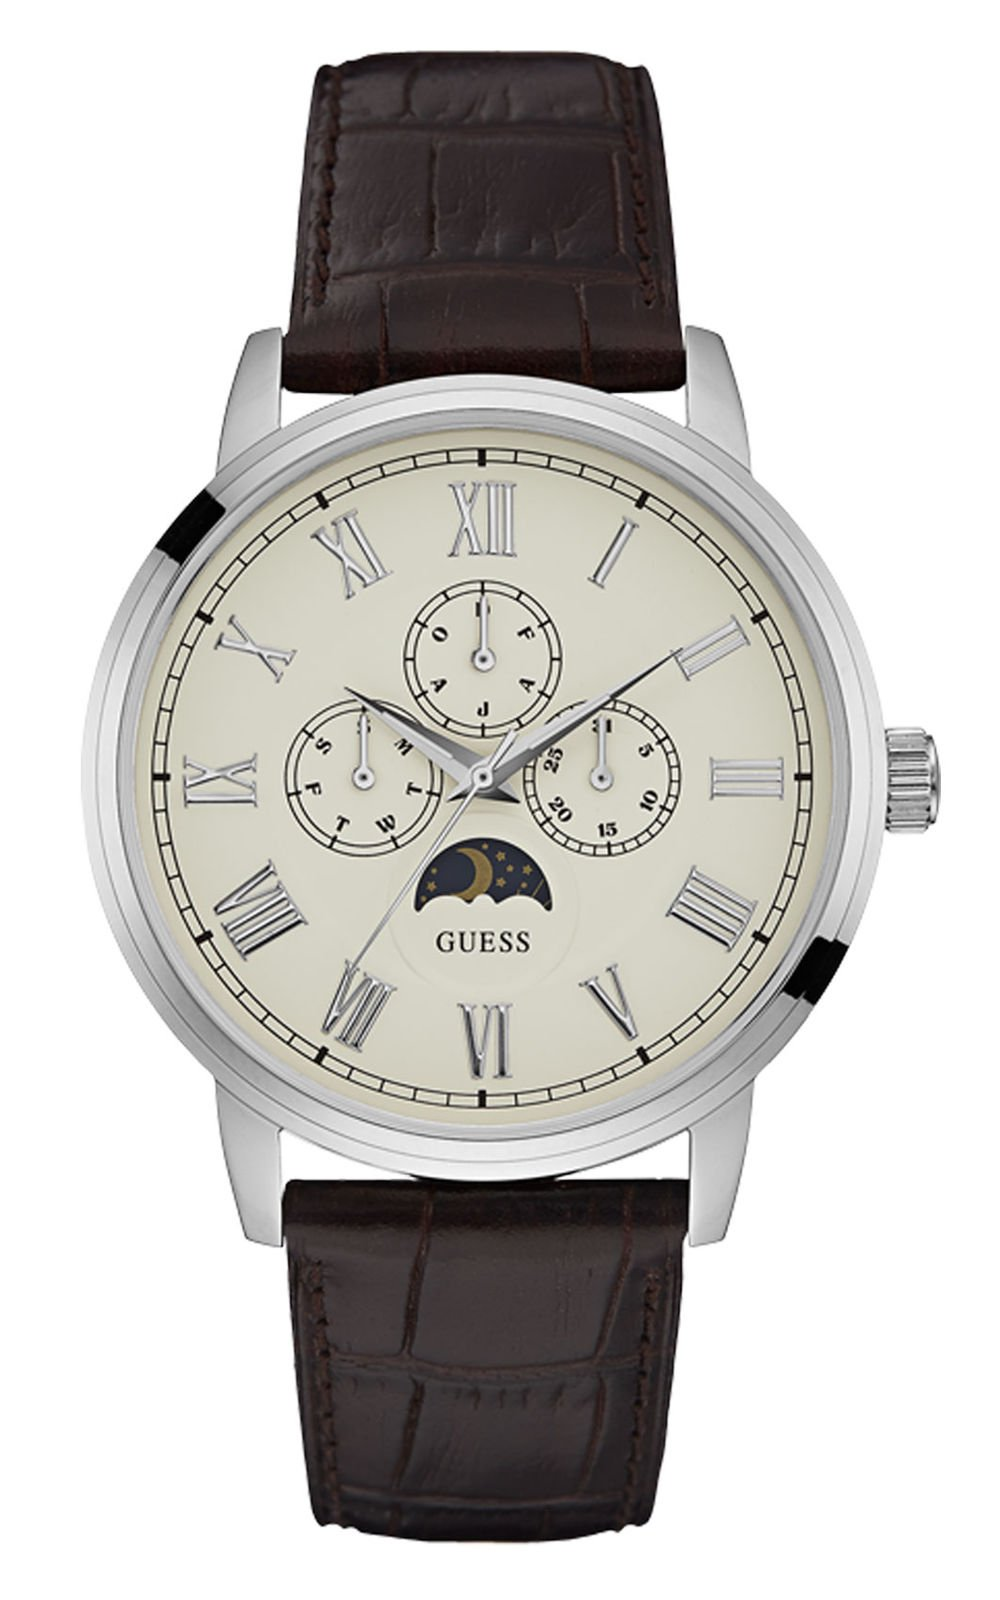 GUESS W0870G1 Ανδρικό Ρολόι Quartz Multi-Function